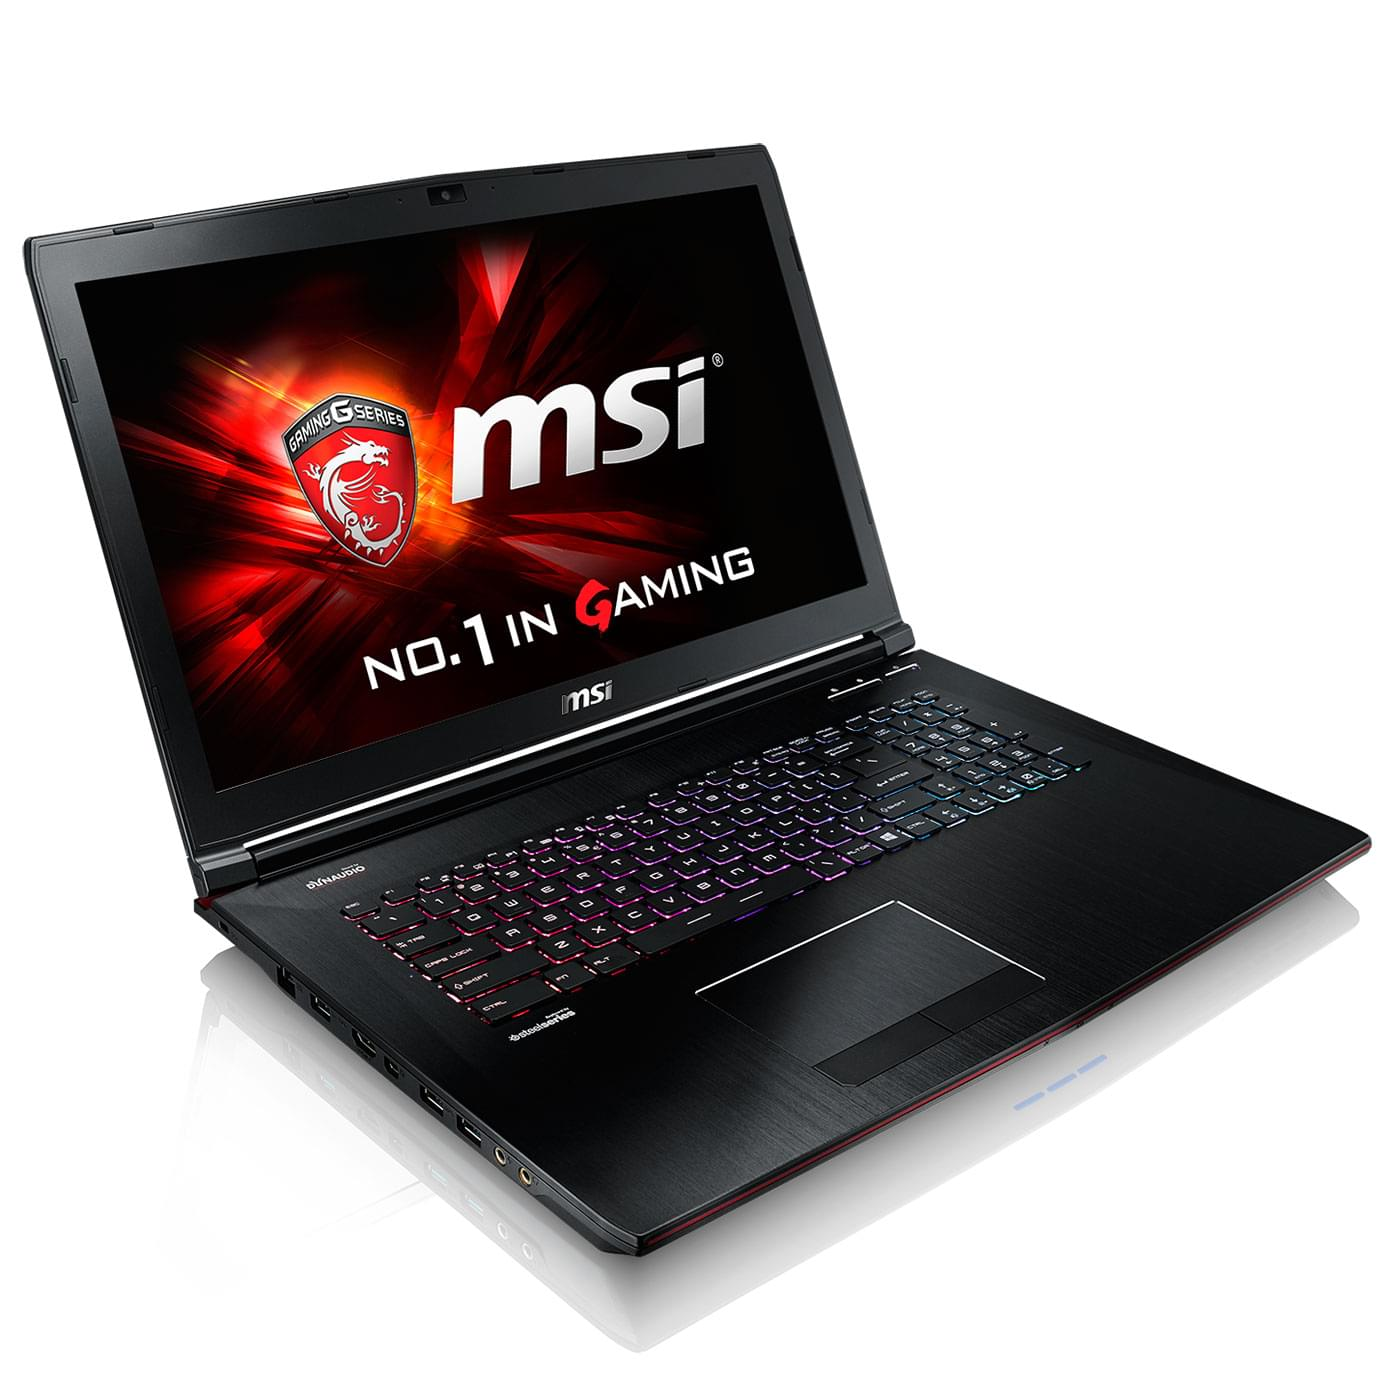 MSI 9S7-179111-216 - PC portable MSI - Cybertek.fr - 0